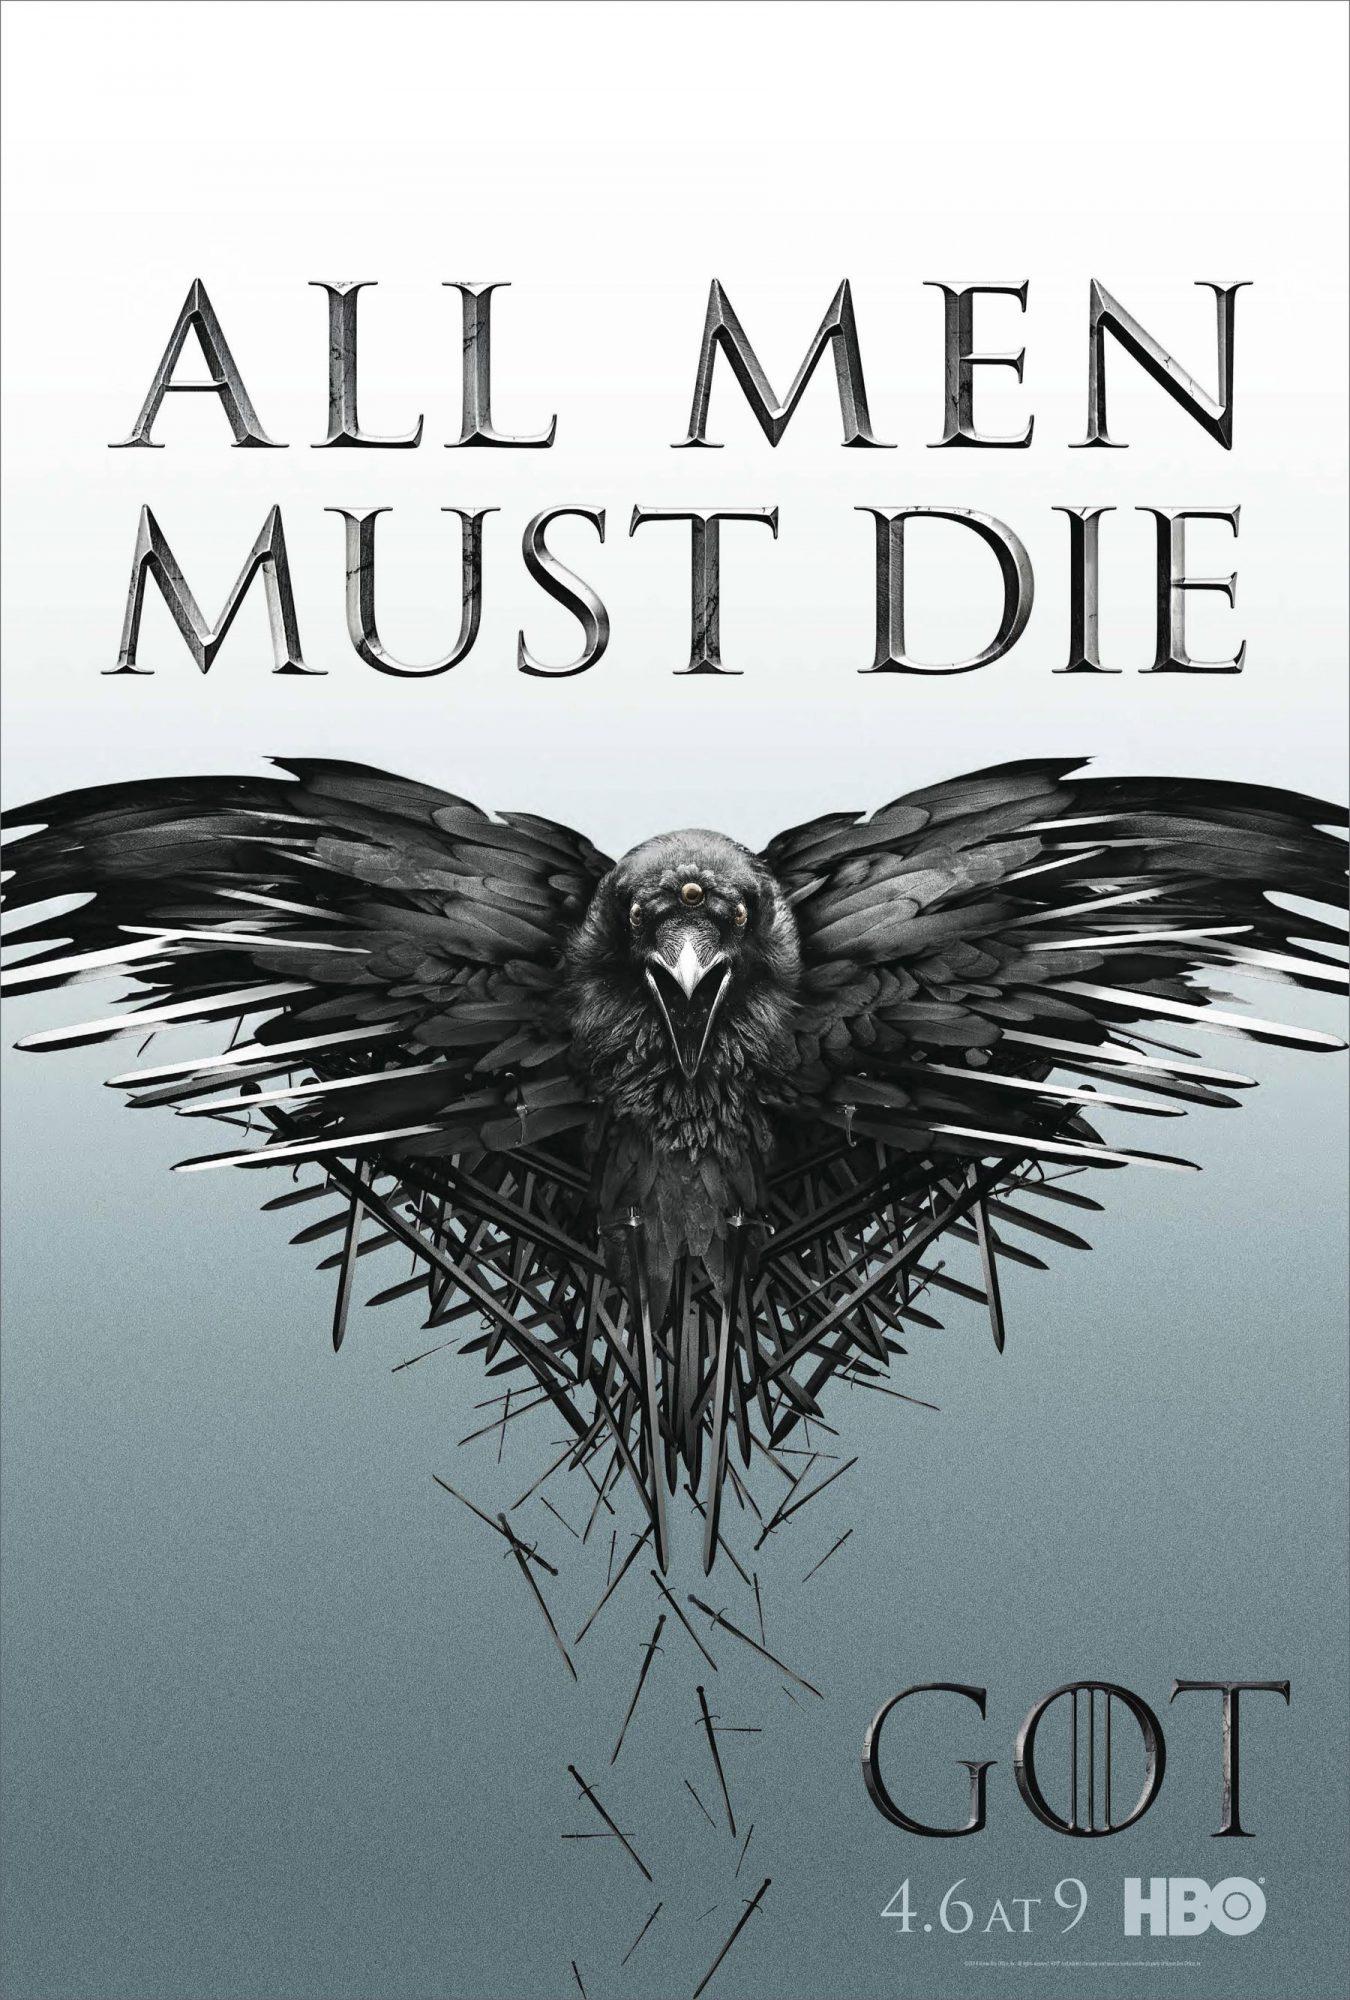 Game of Thrones poster/key artSeason 4CR: HBO